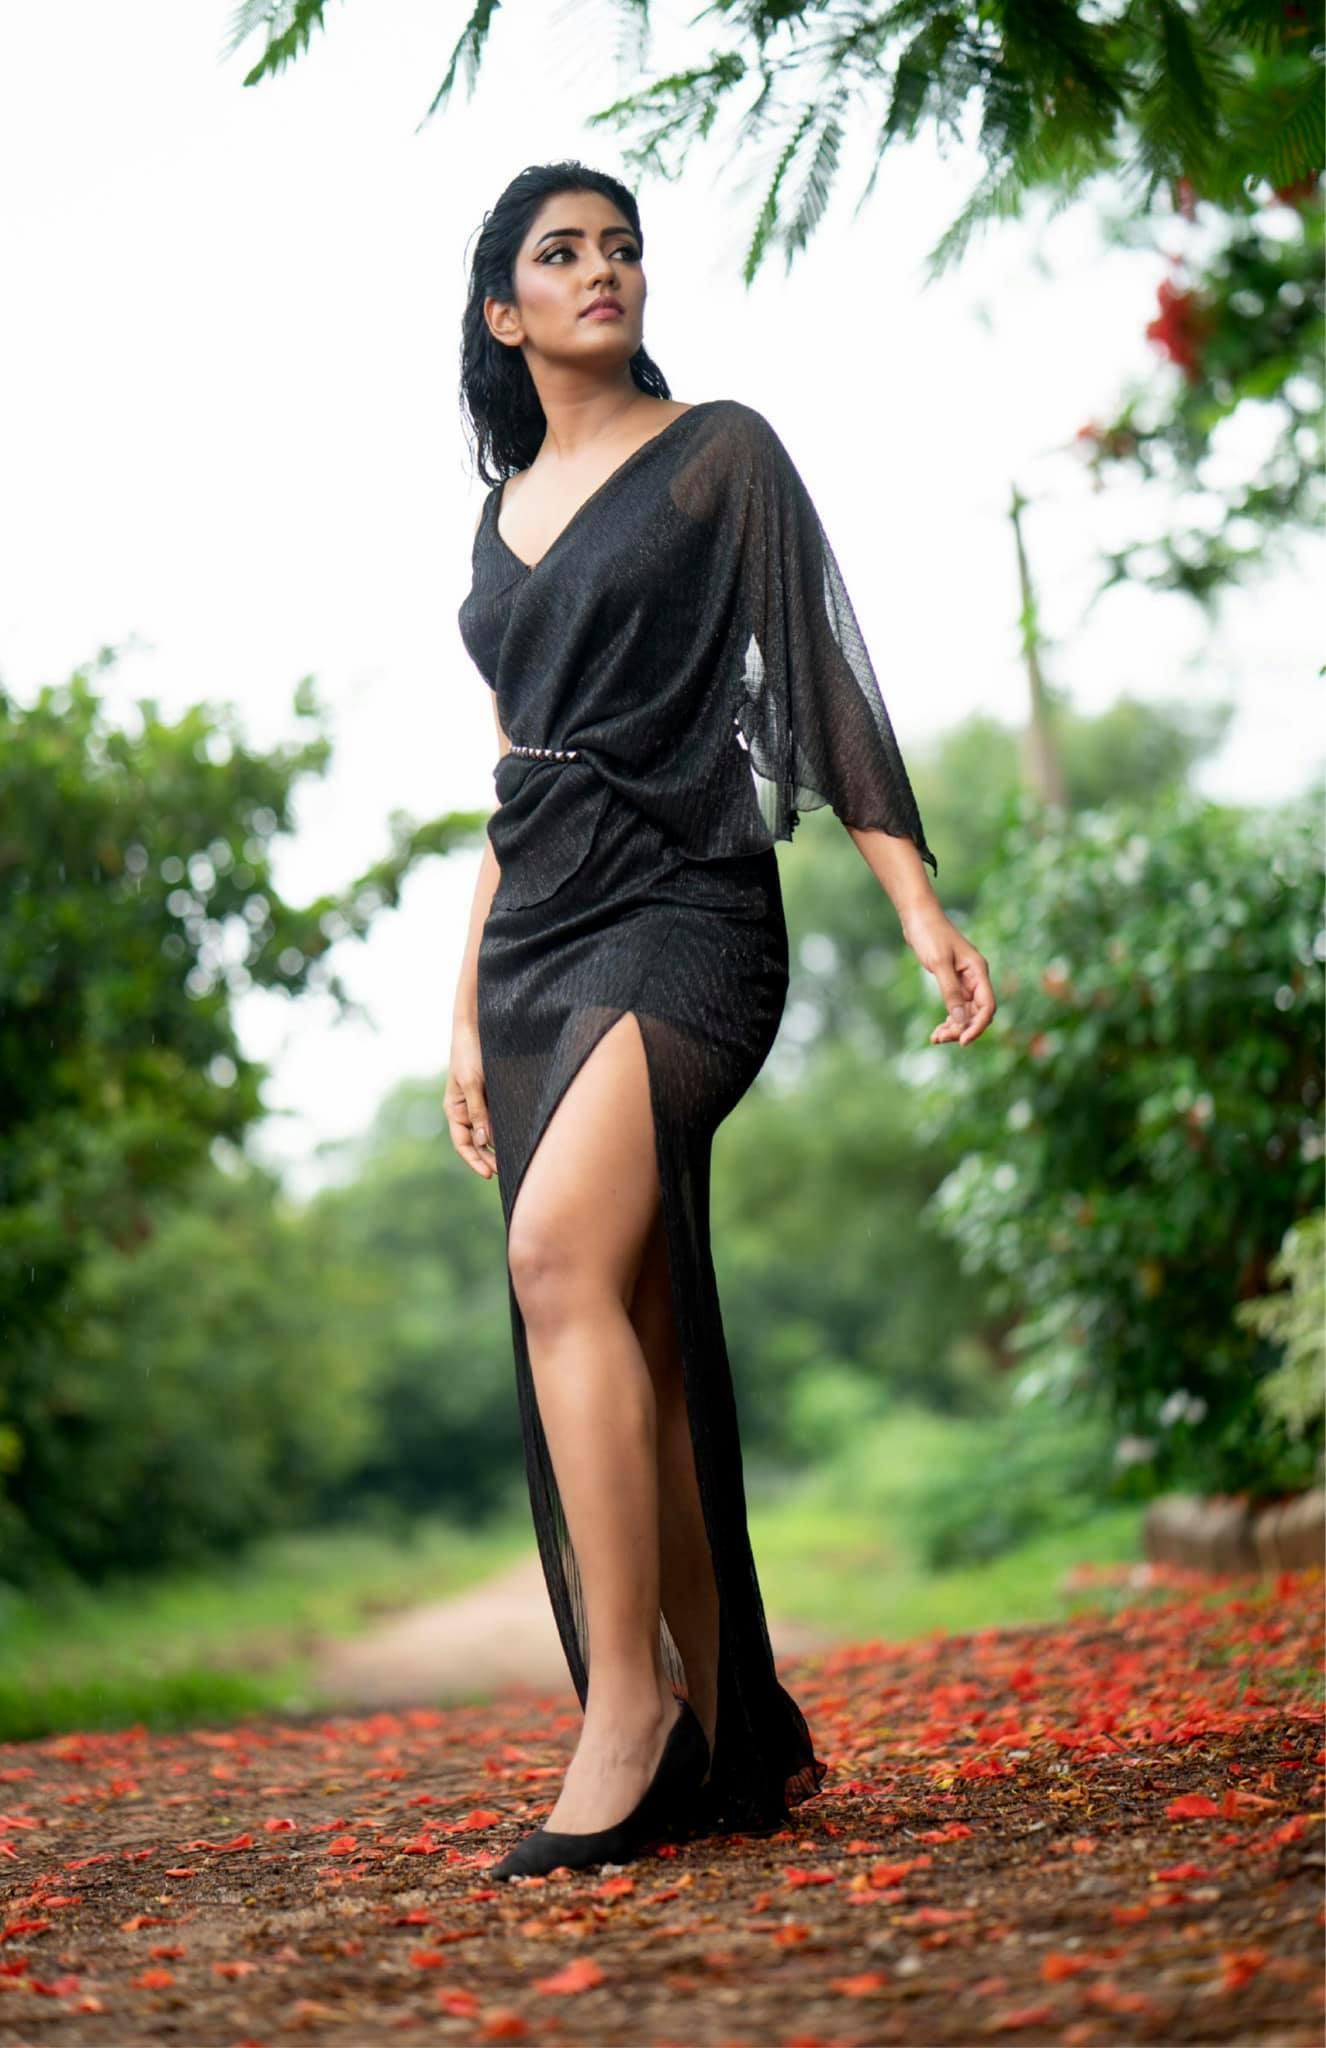 Eesha Rebba recent hot photos